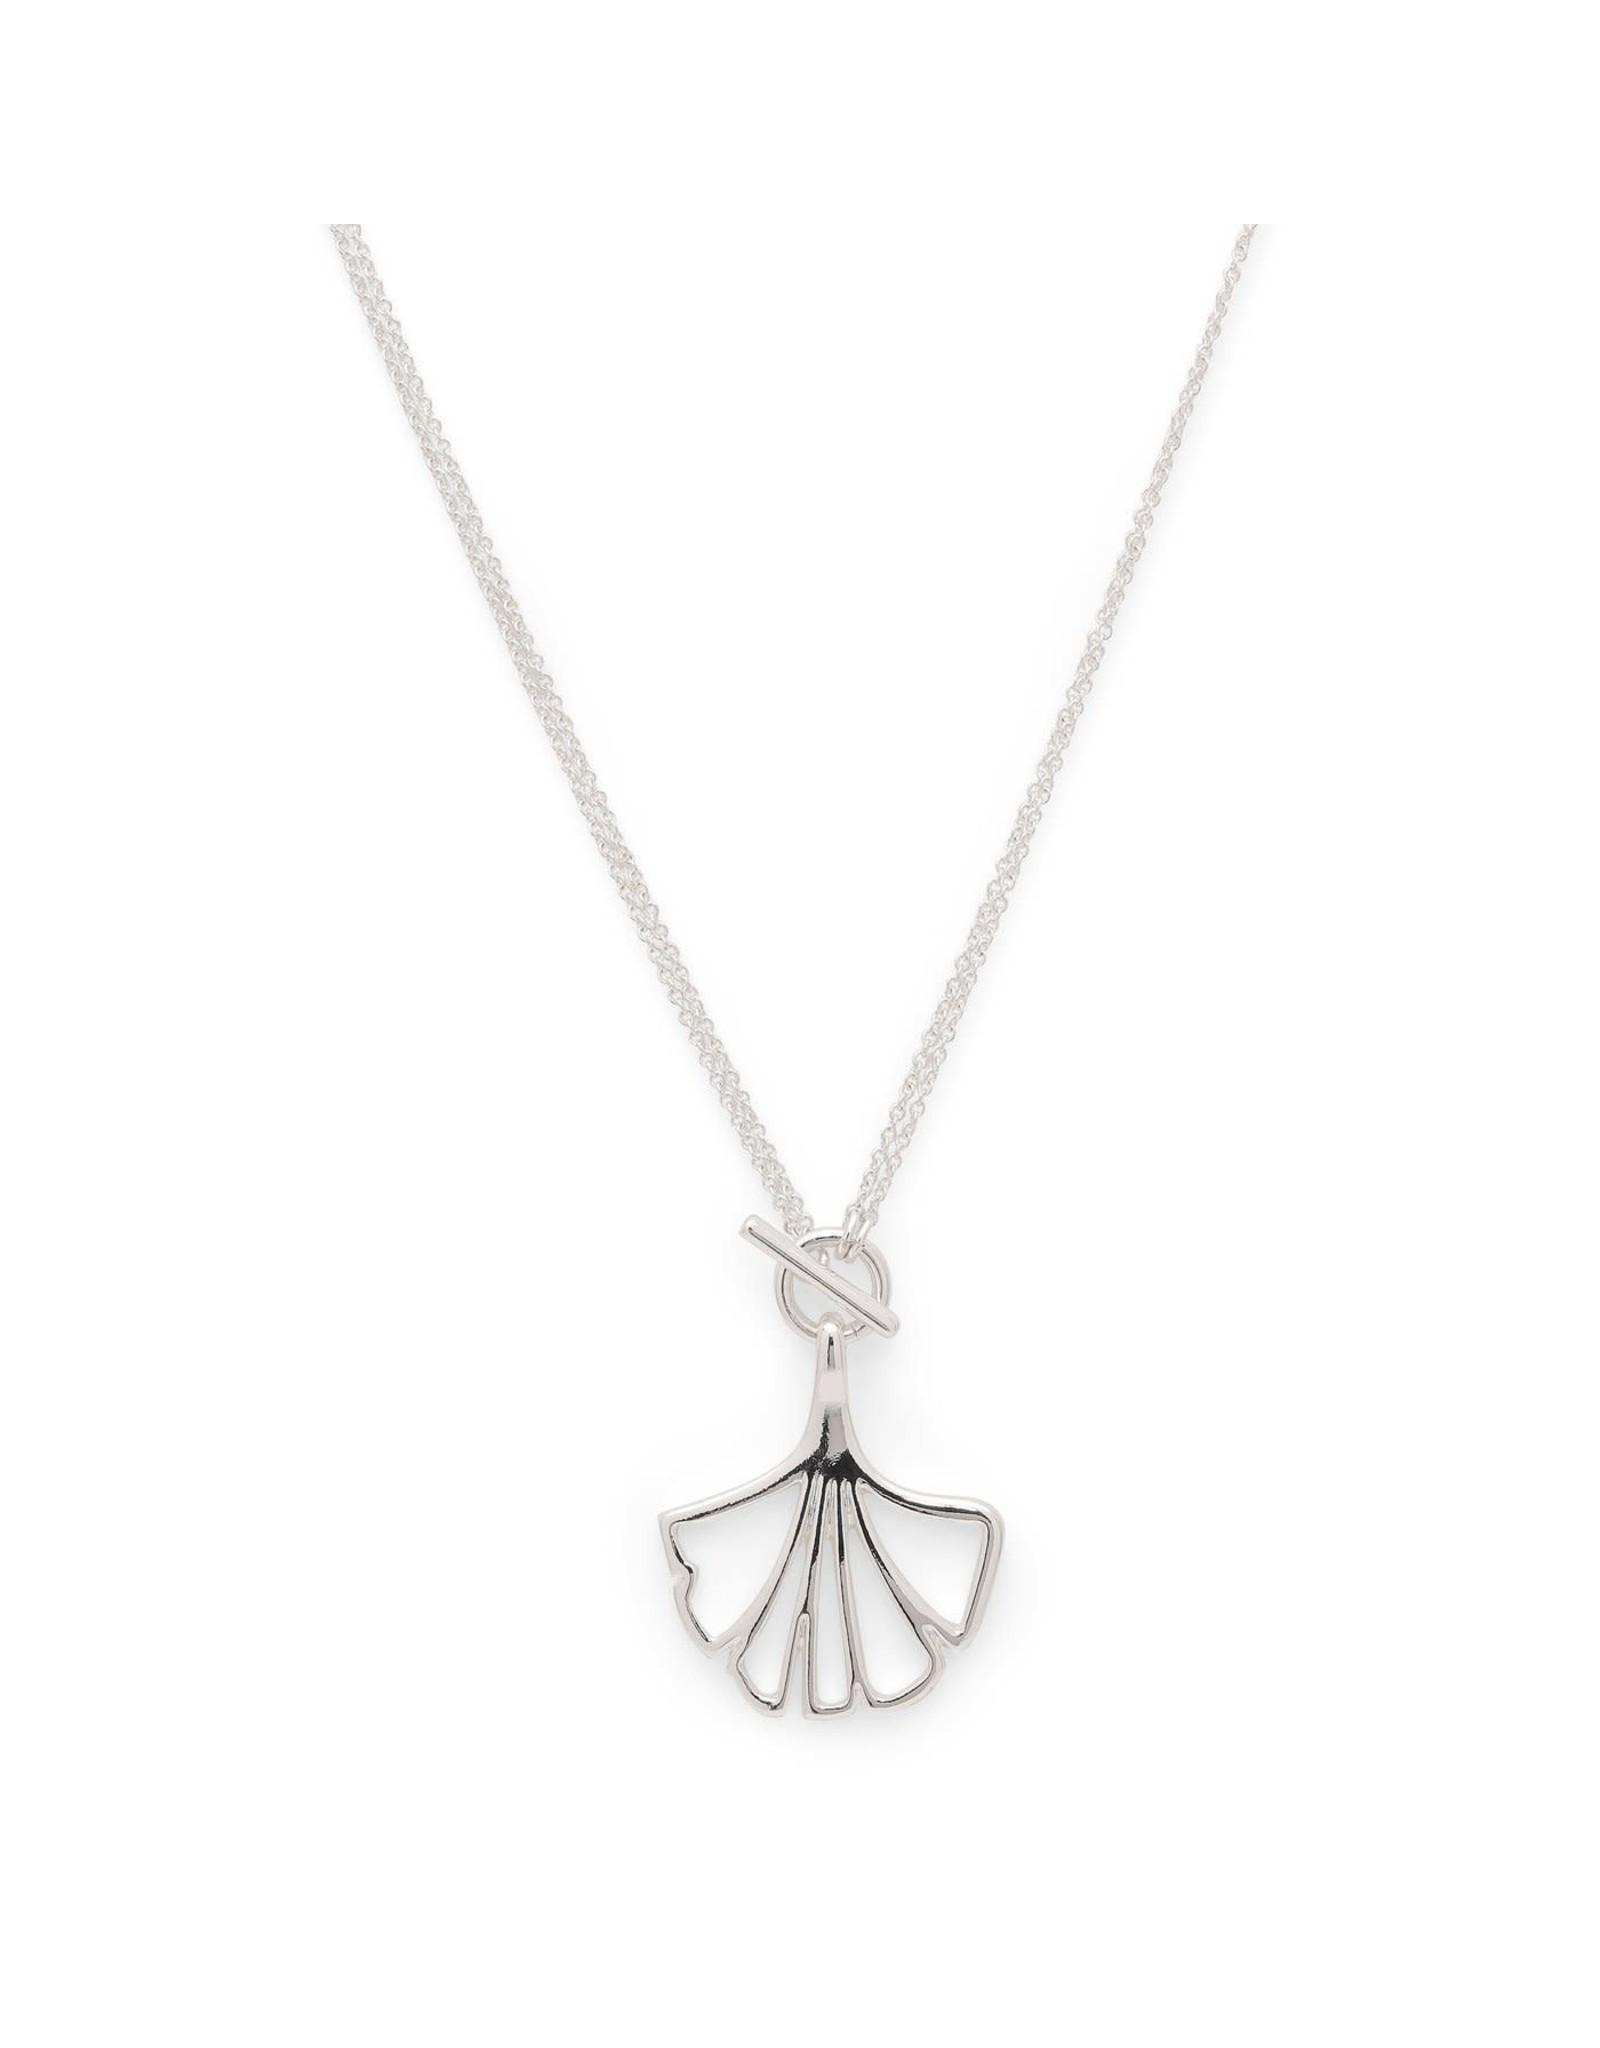 Pilgrim Pilgrim Silver Plated Saki Necklace